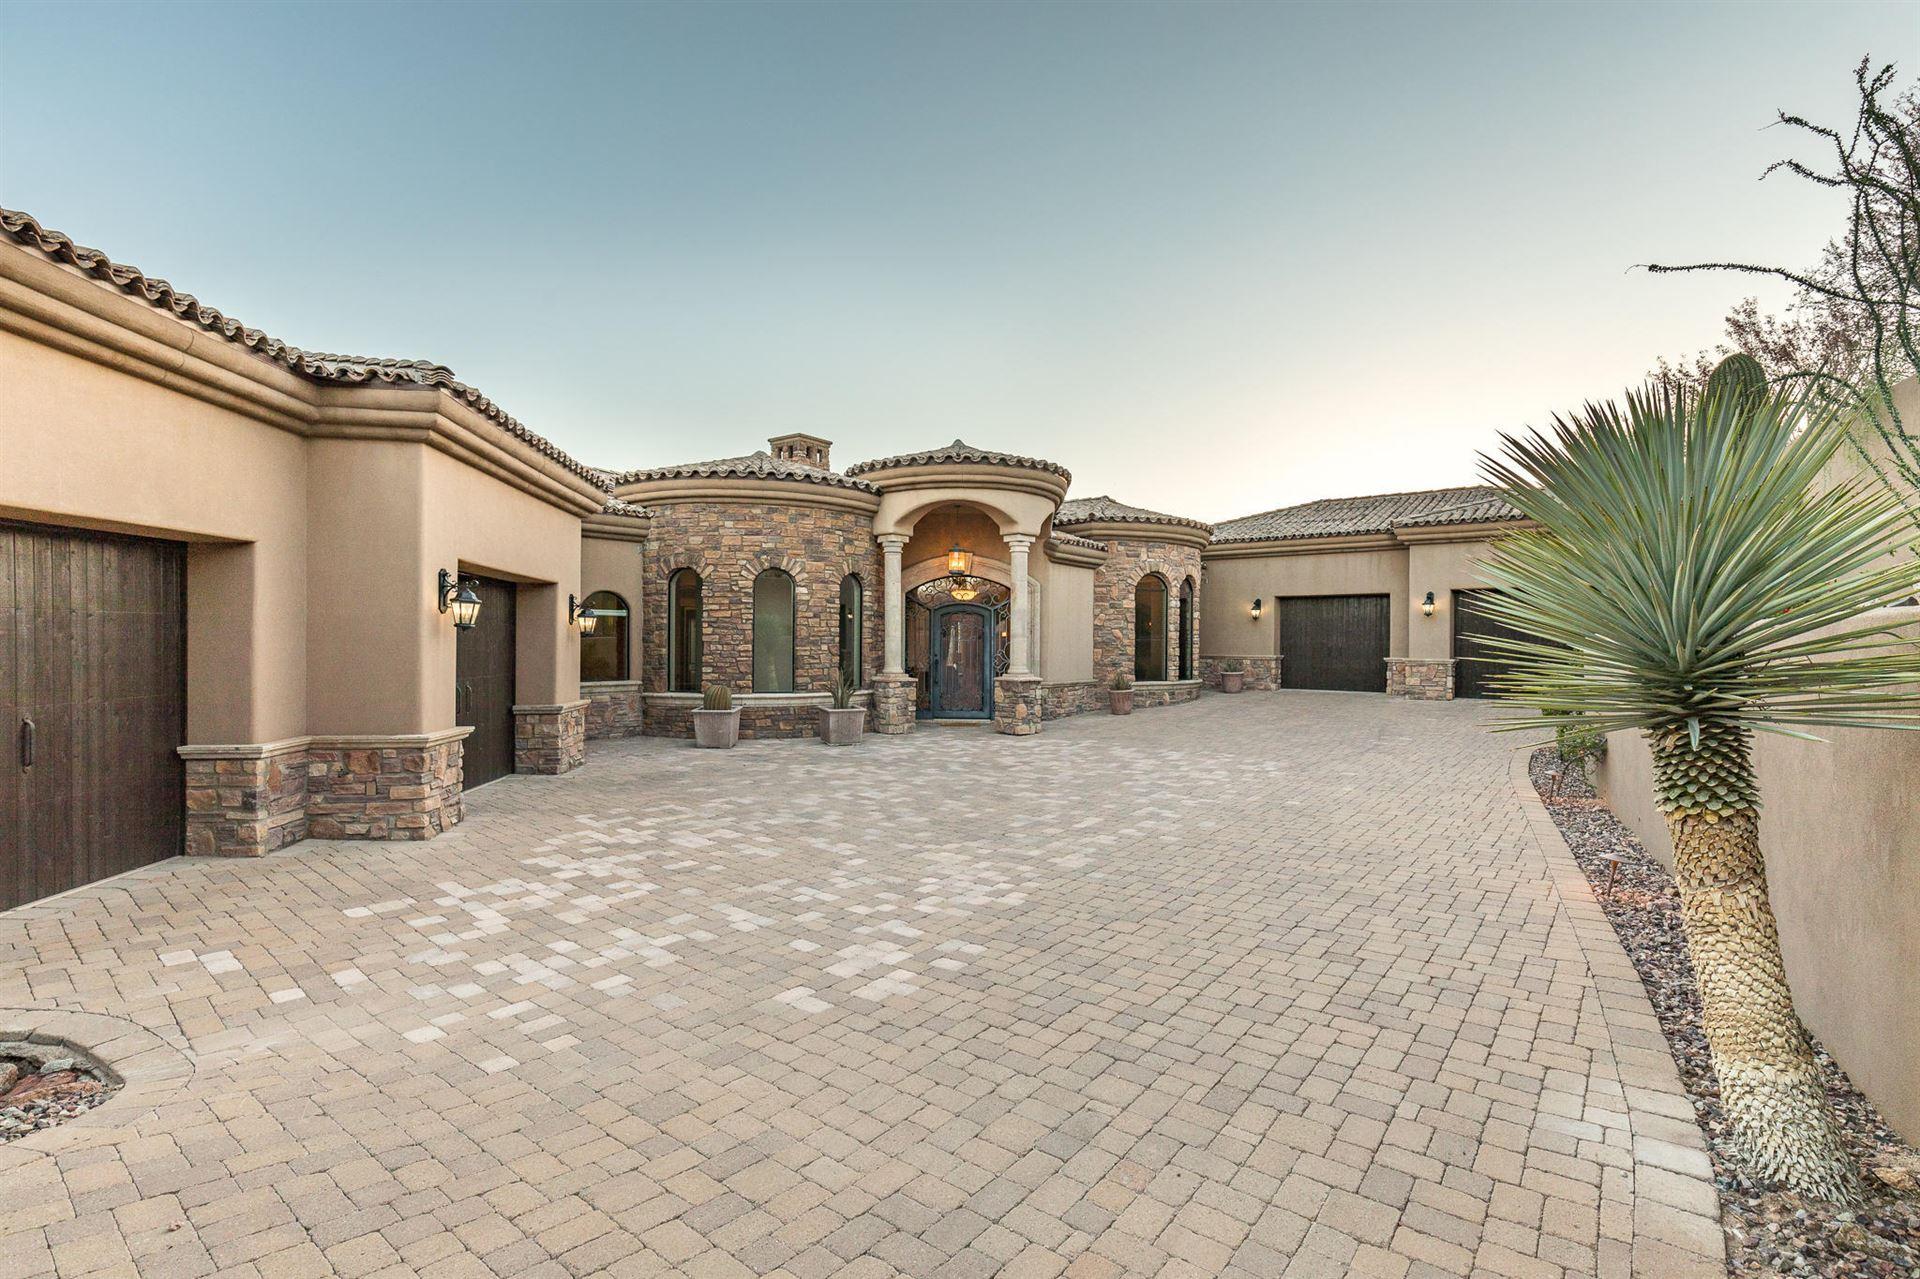 Photo of 10220 N PALISADES Boulevard, Fountain Hills, AZ 85268 (MLS # 6233592)